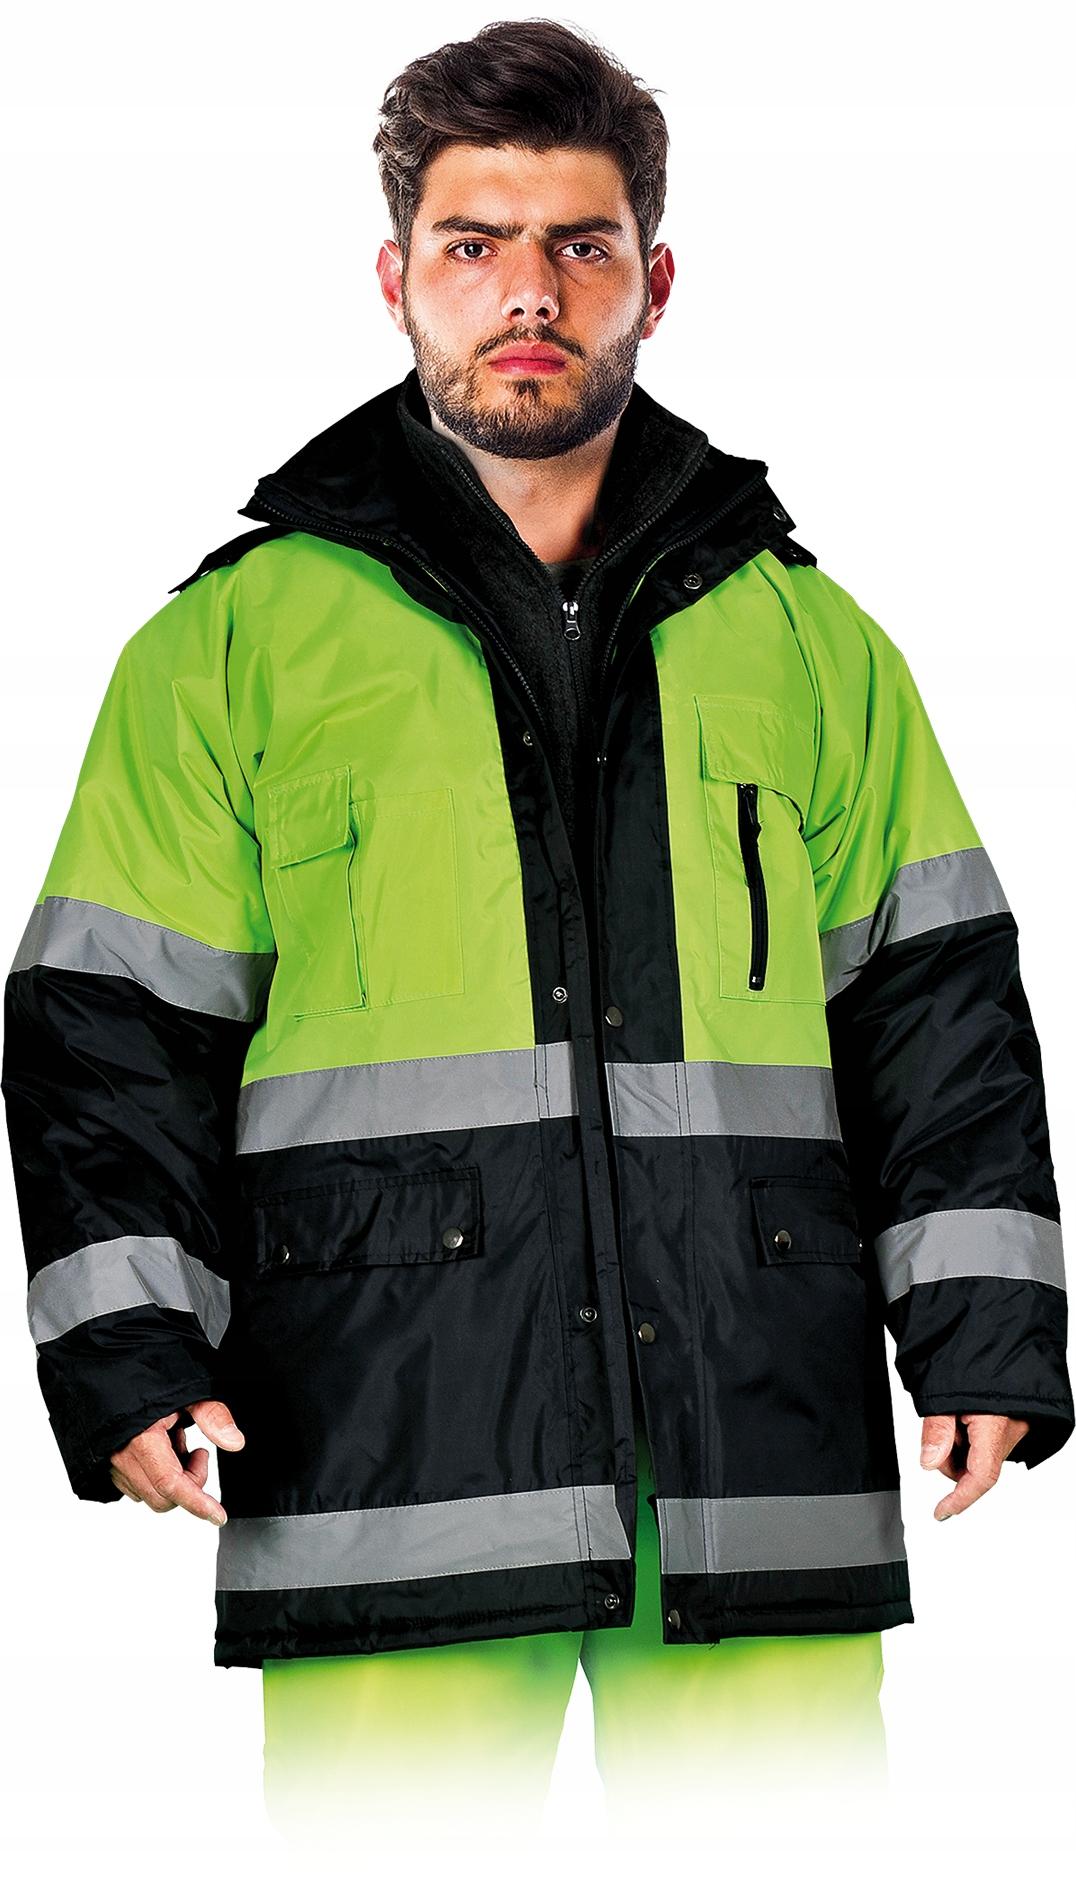 Куртка Мягкий Зимняя охране ТРУДА Рабочая Светоотражающая М